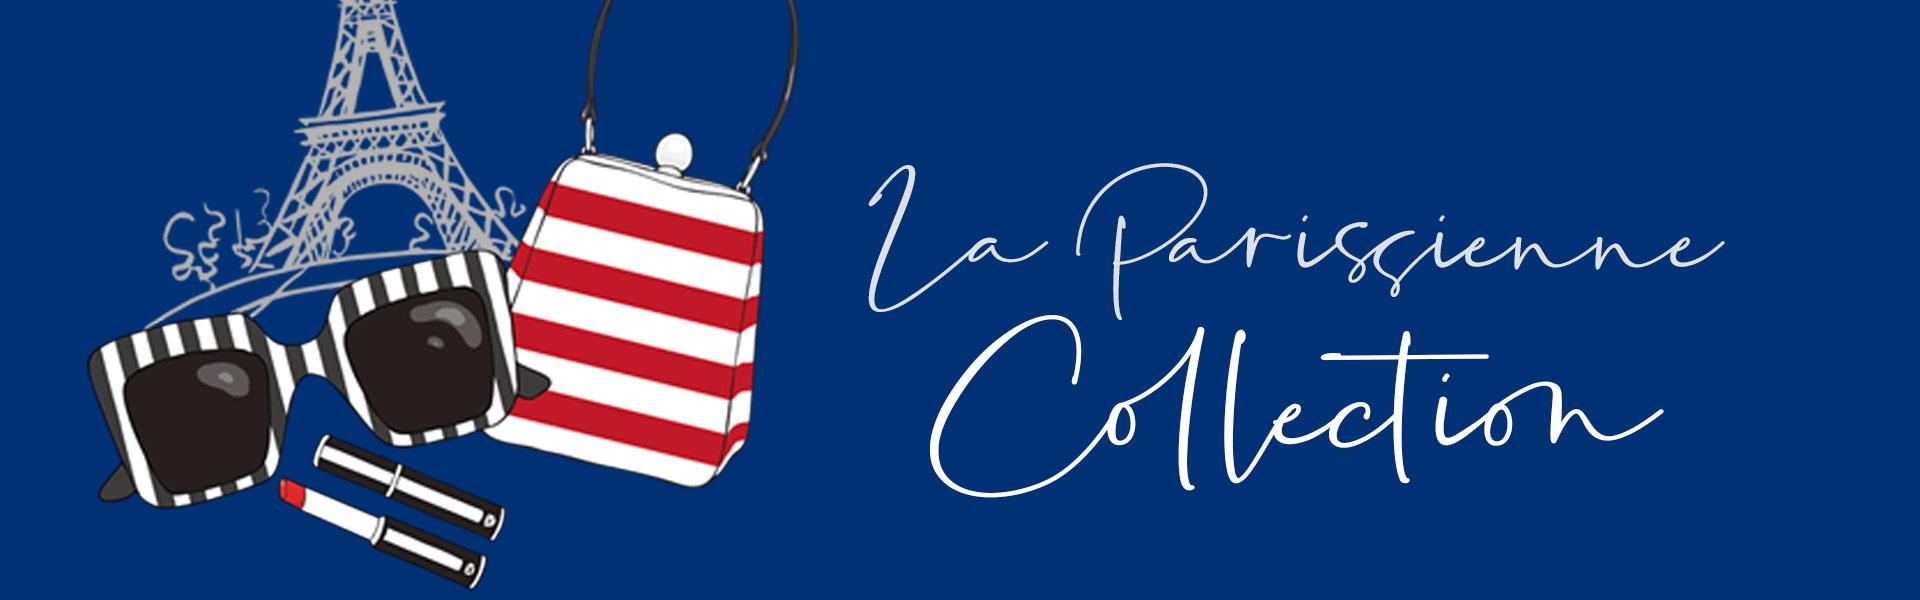 t-shirts la parisienne, la collection tee-shirt,sweatshirt